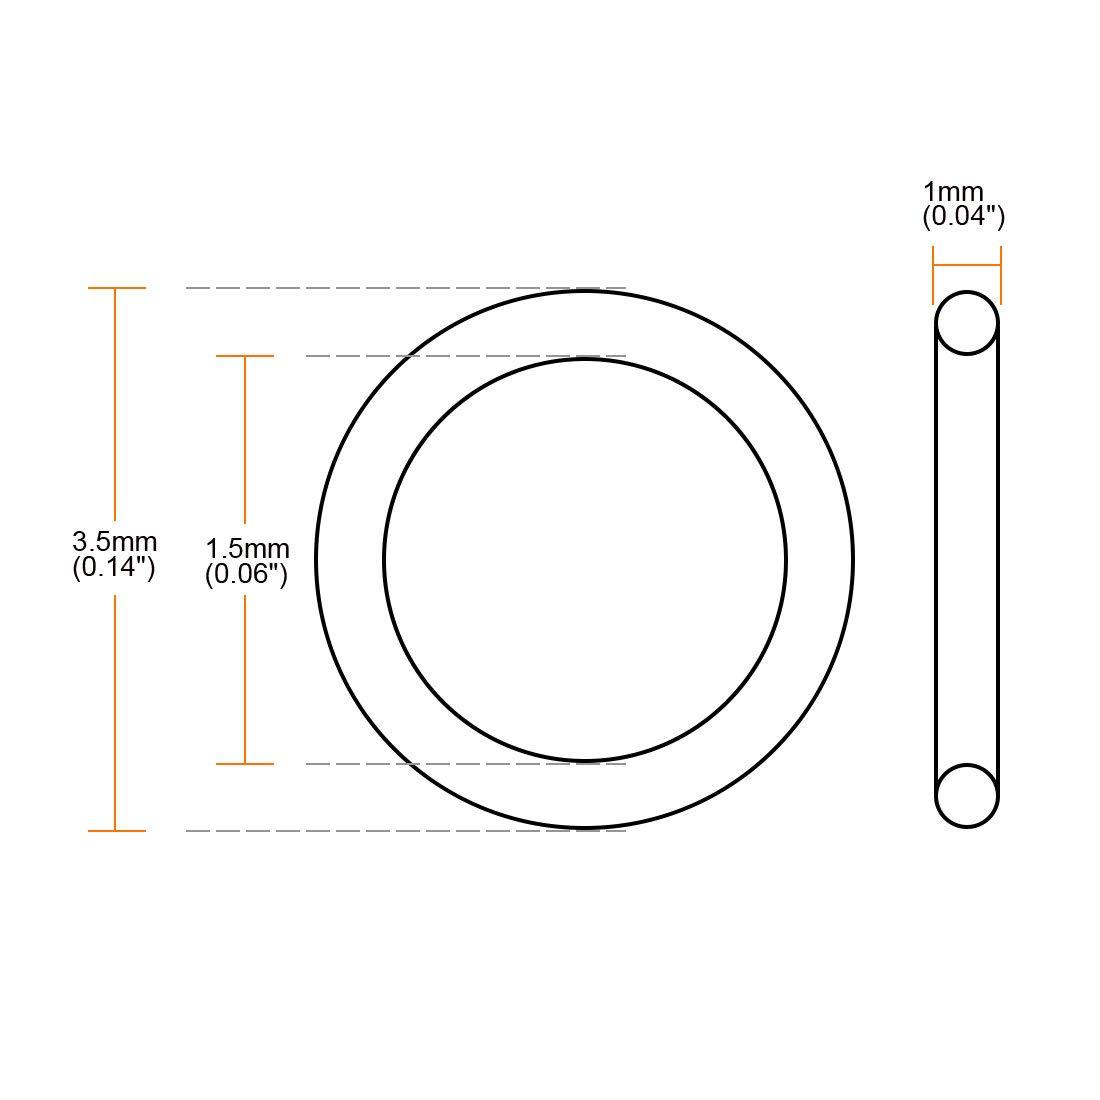 Ø3.1mm Querschnitt NBR Nitrile O-Ring Dichtring Dichtungsring Oil Sealing Washer